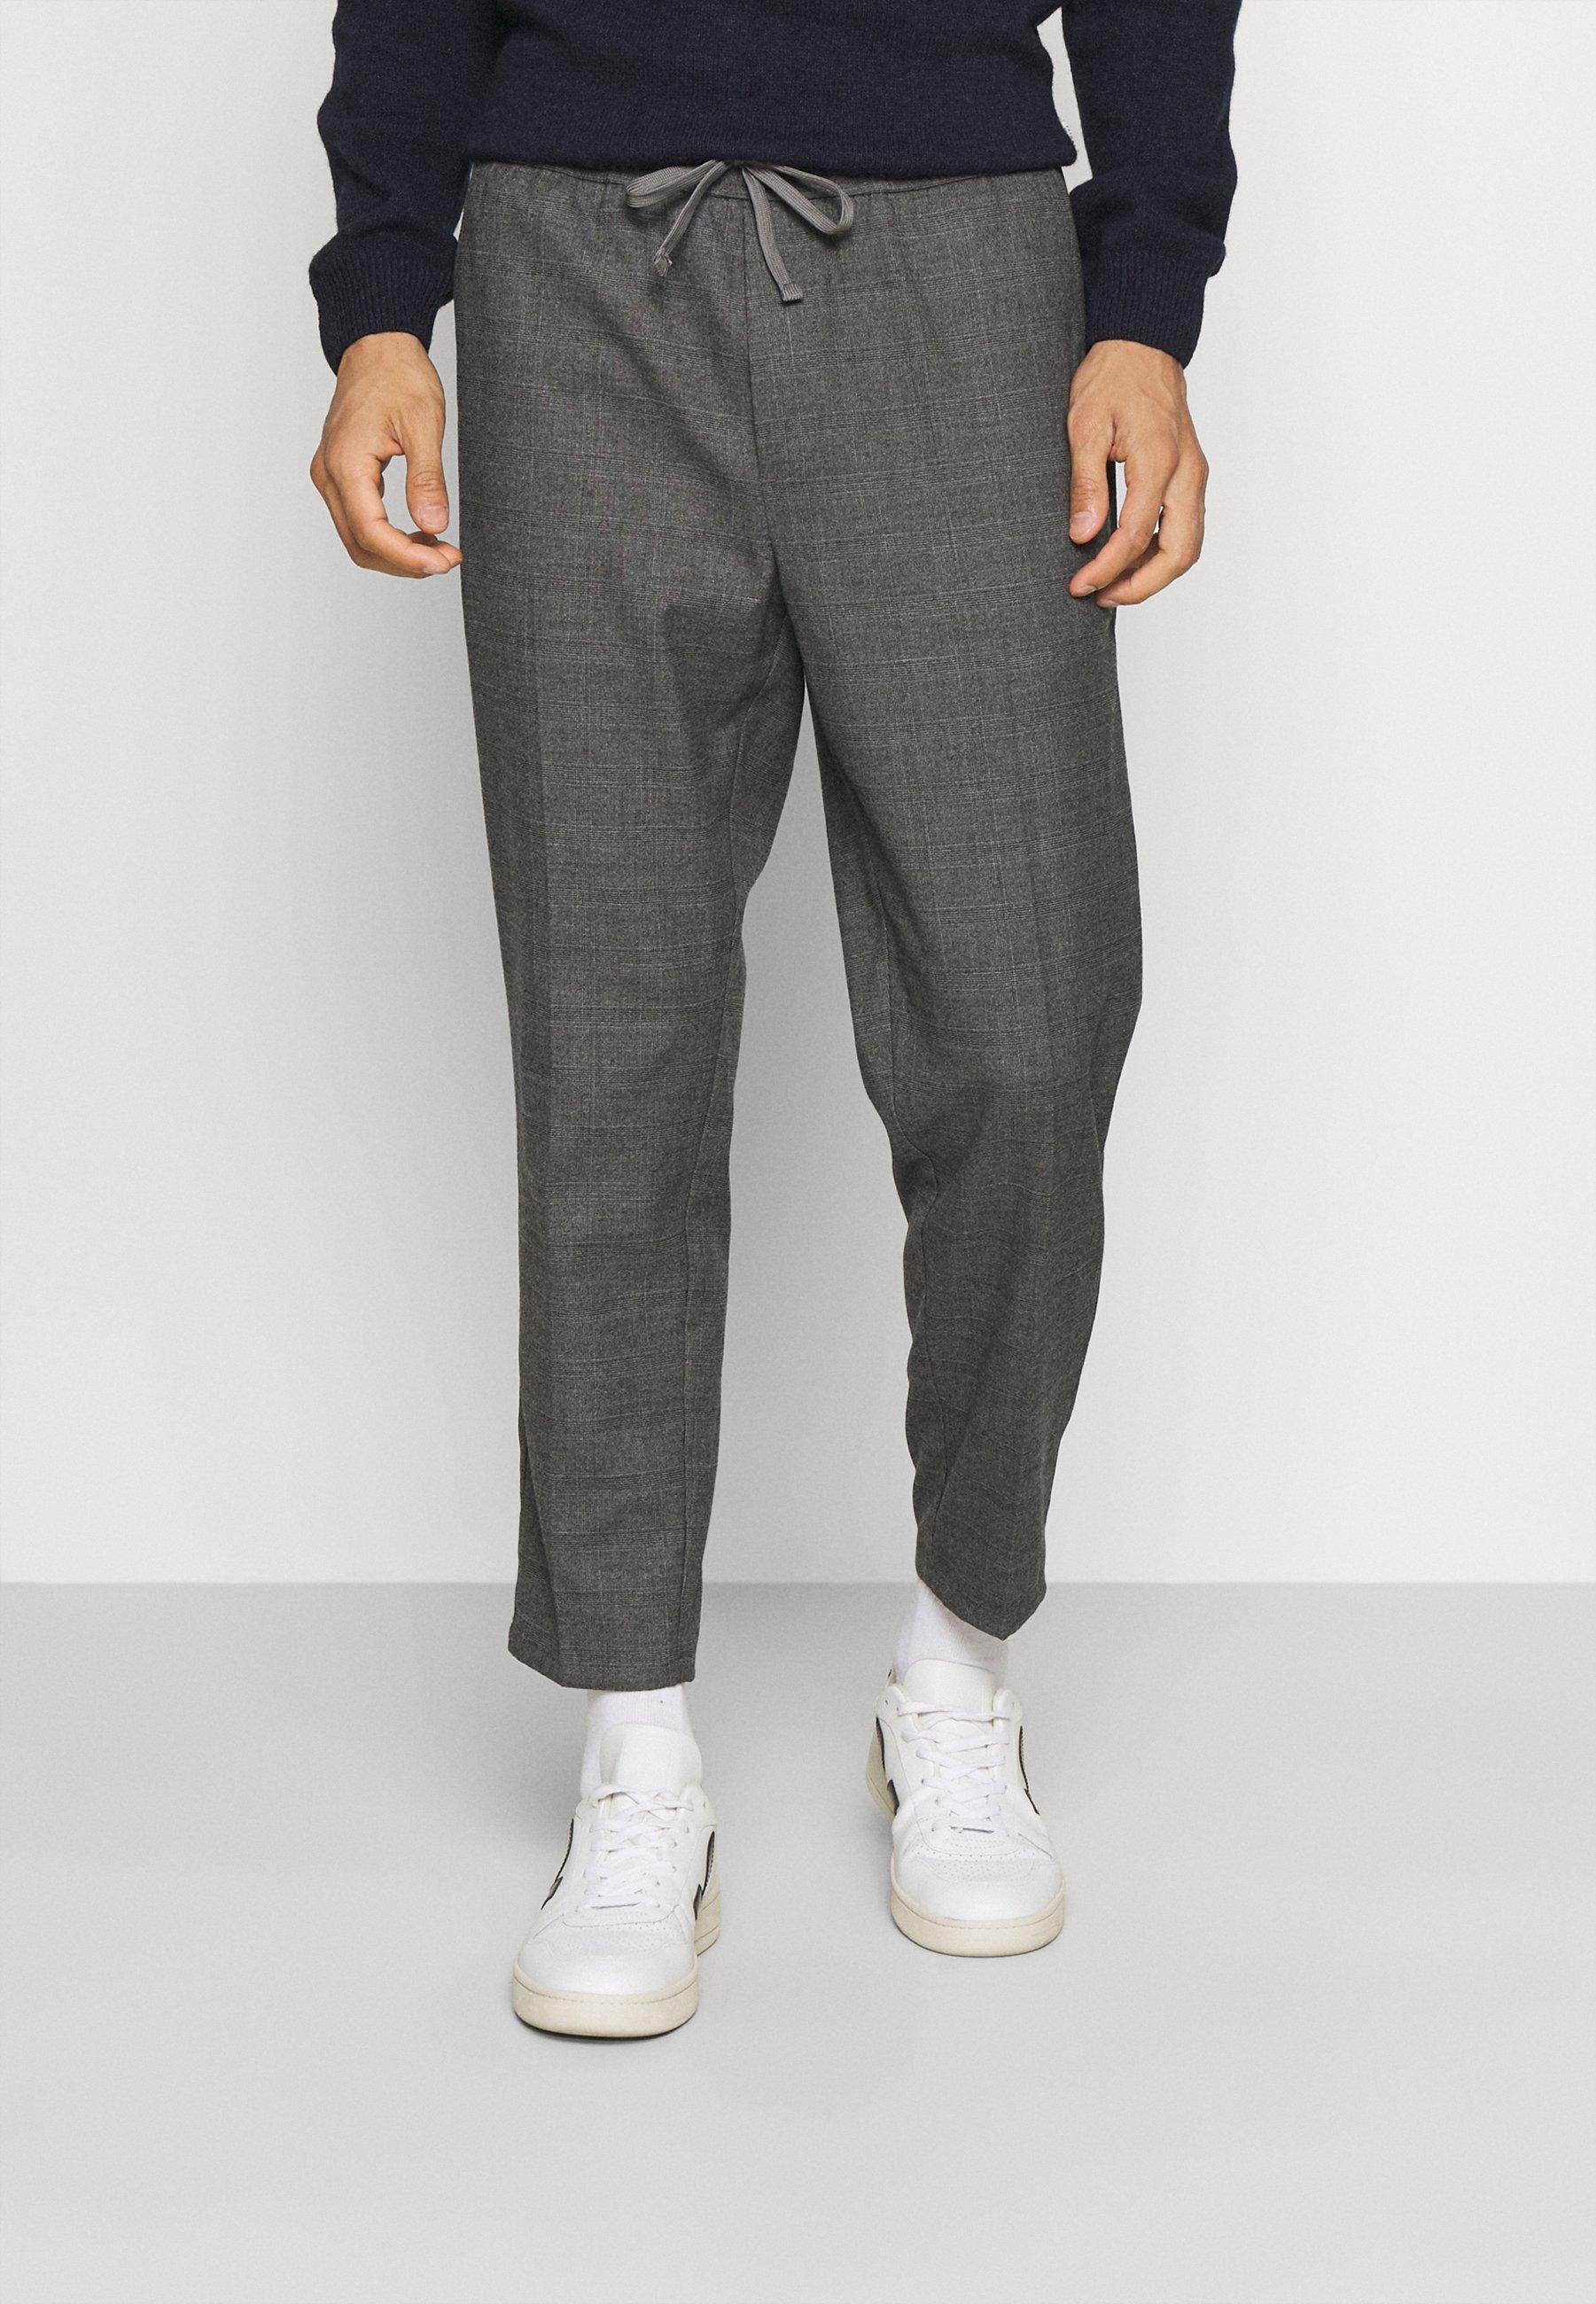 Uomo PILOU CHECKED PANTS - Pantaloni